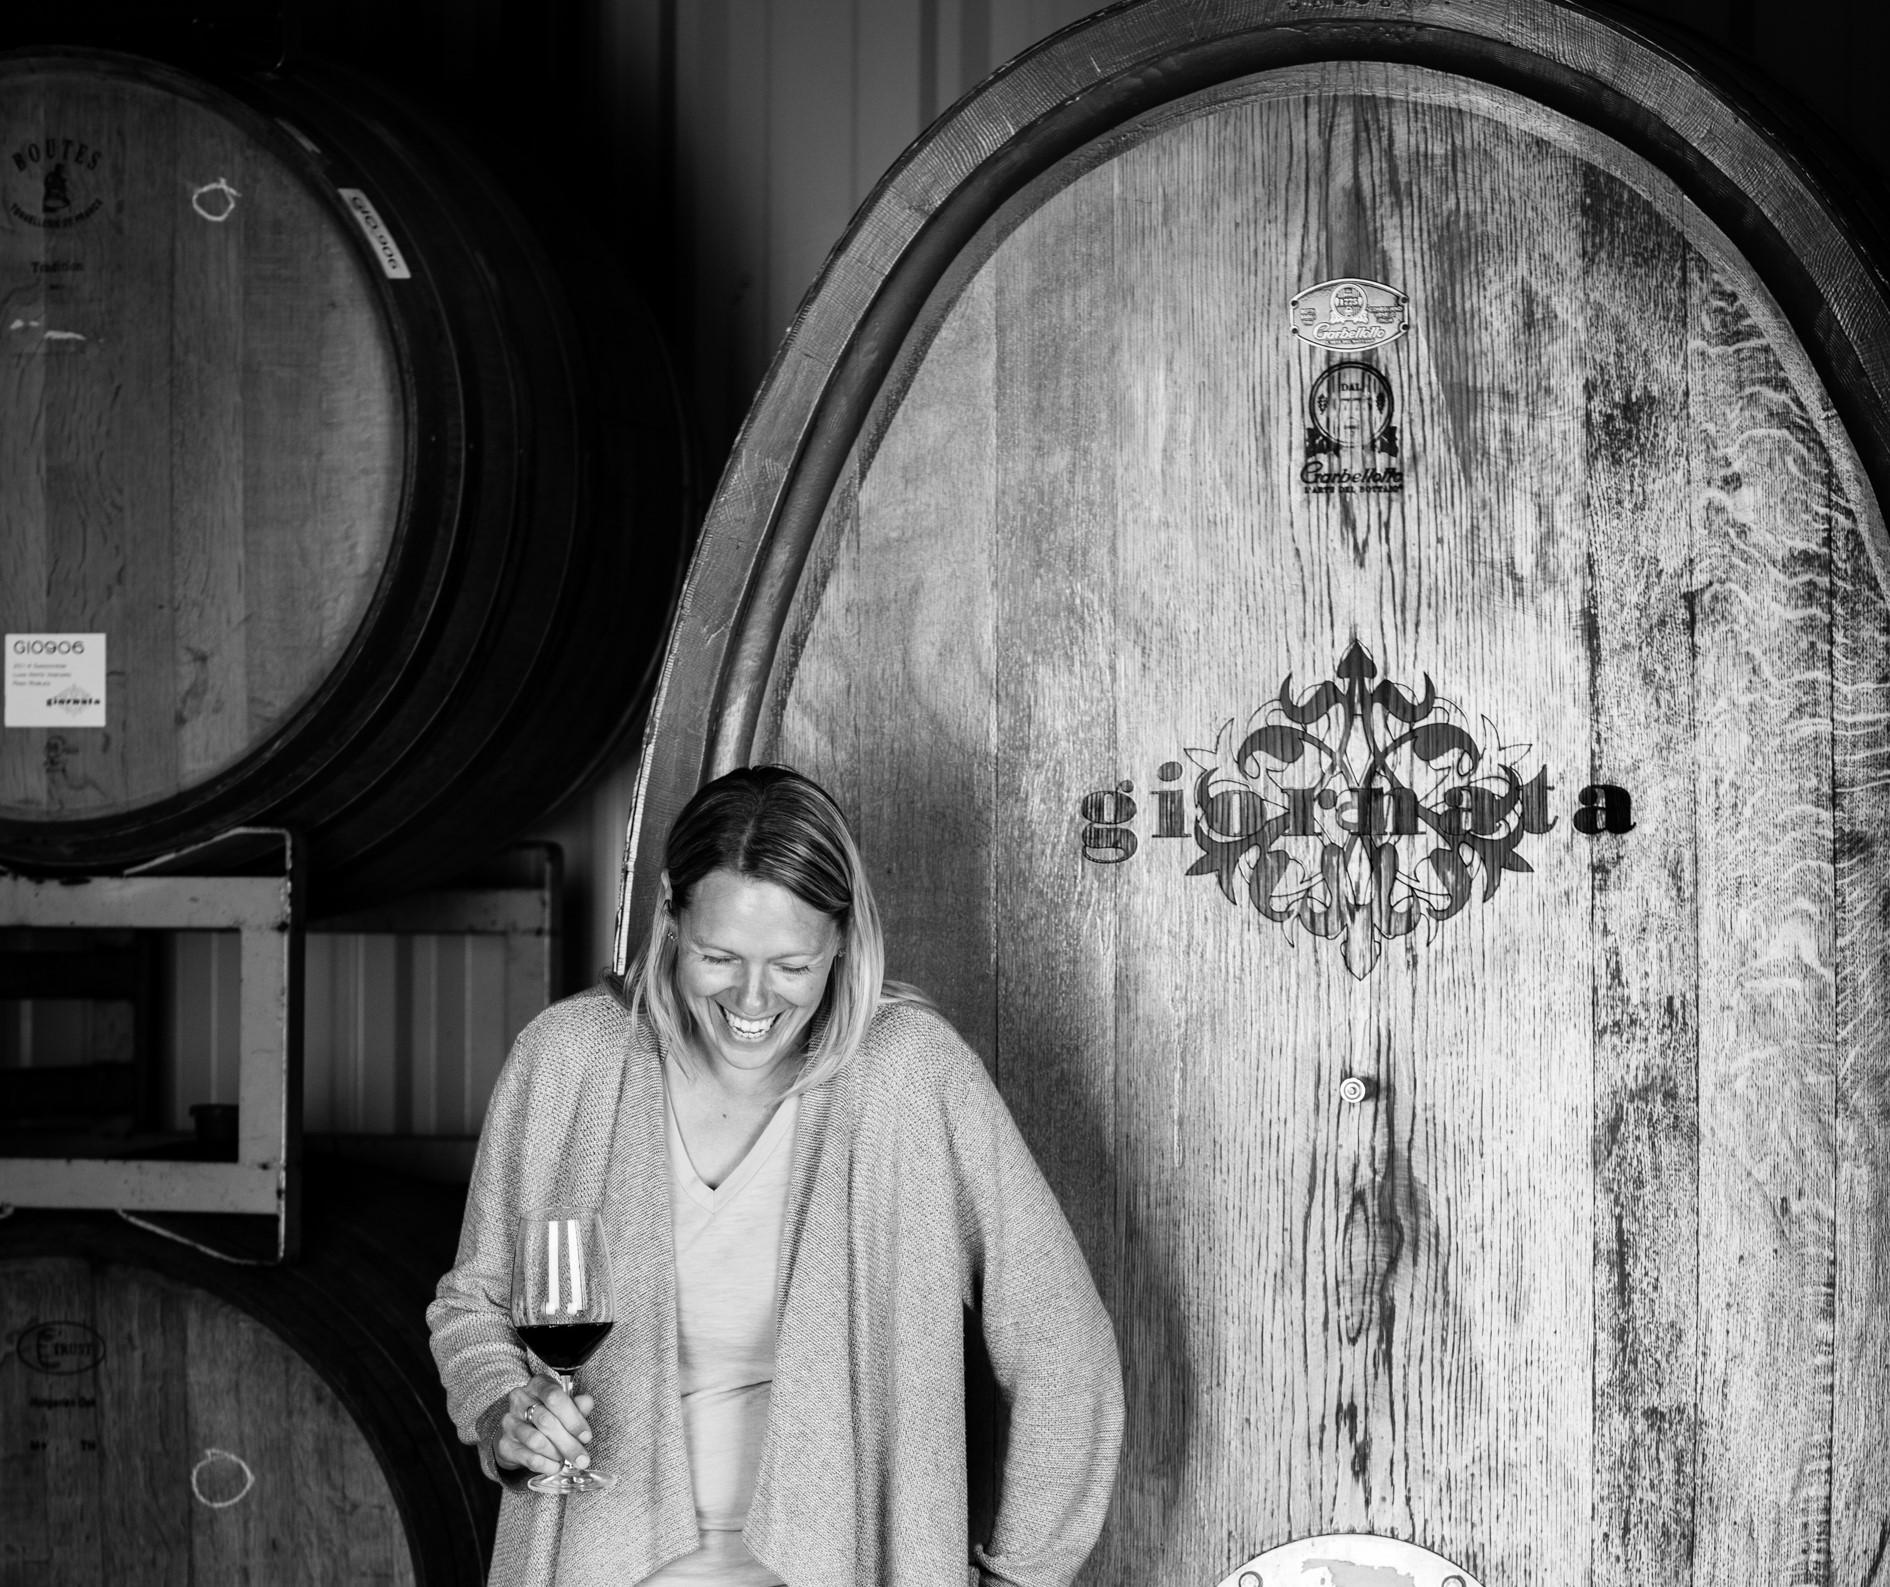 Stephanie Terrizzi with one of Giornata's Botti (large cask).